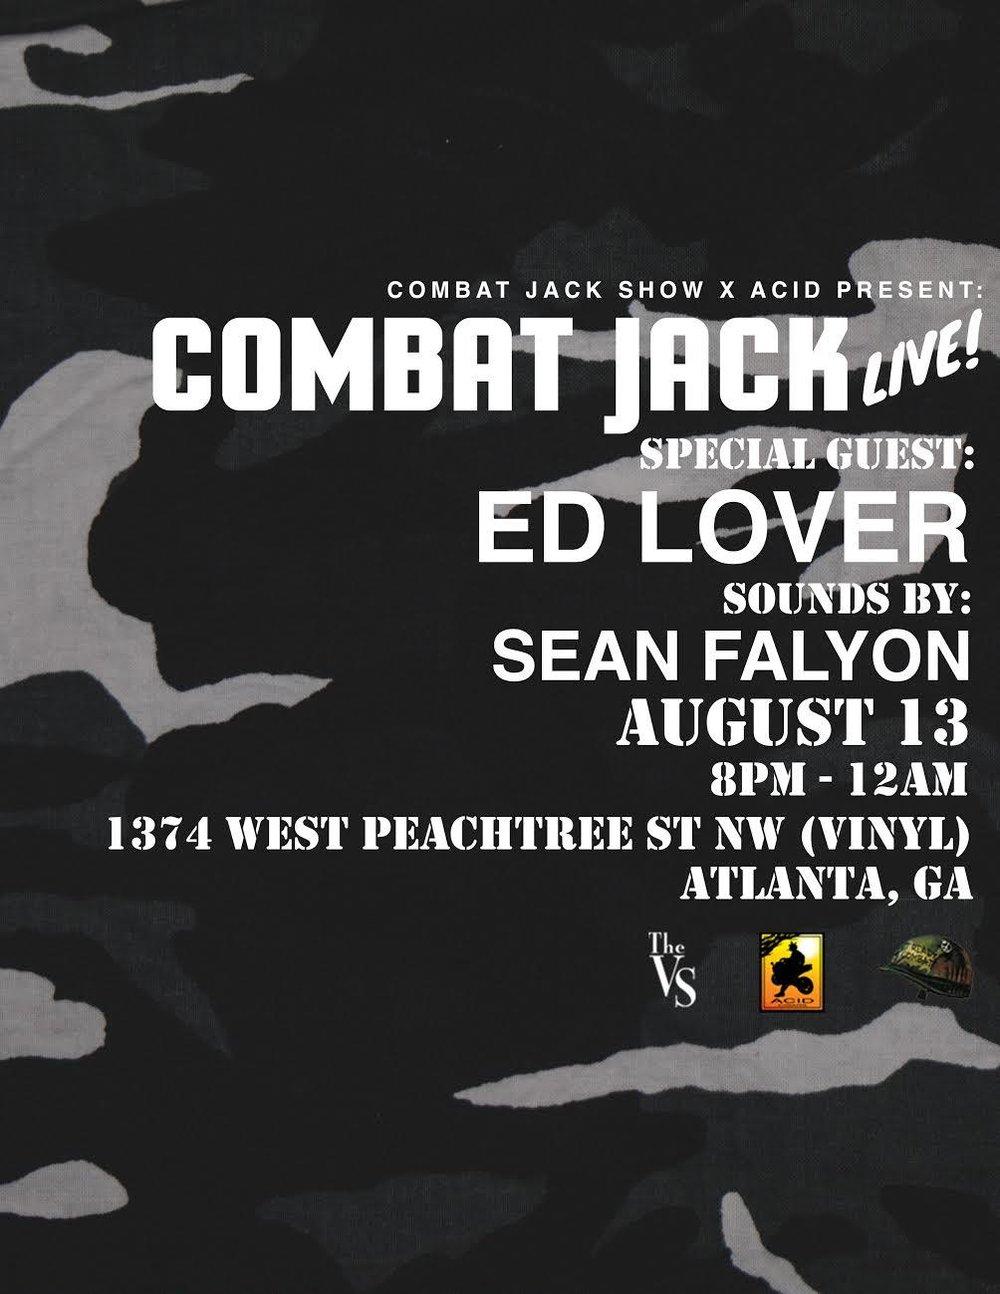 CombatJackLiveAtlanta.jpg